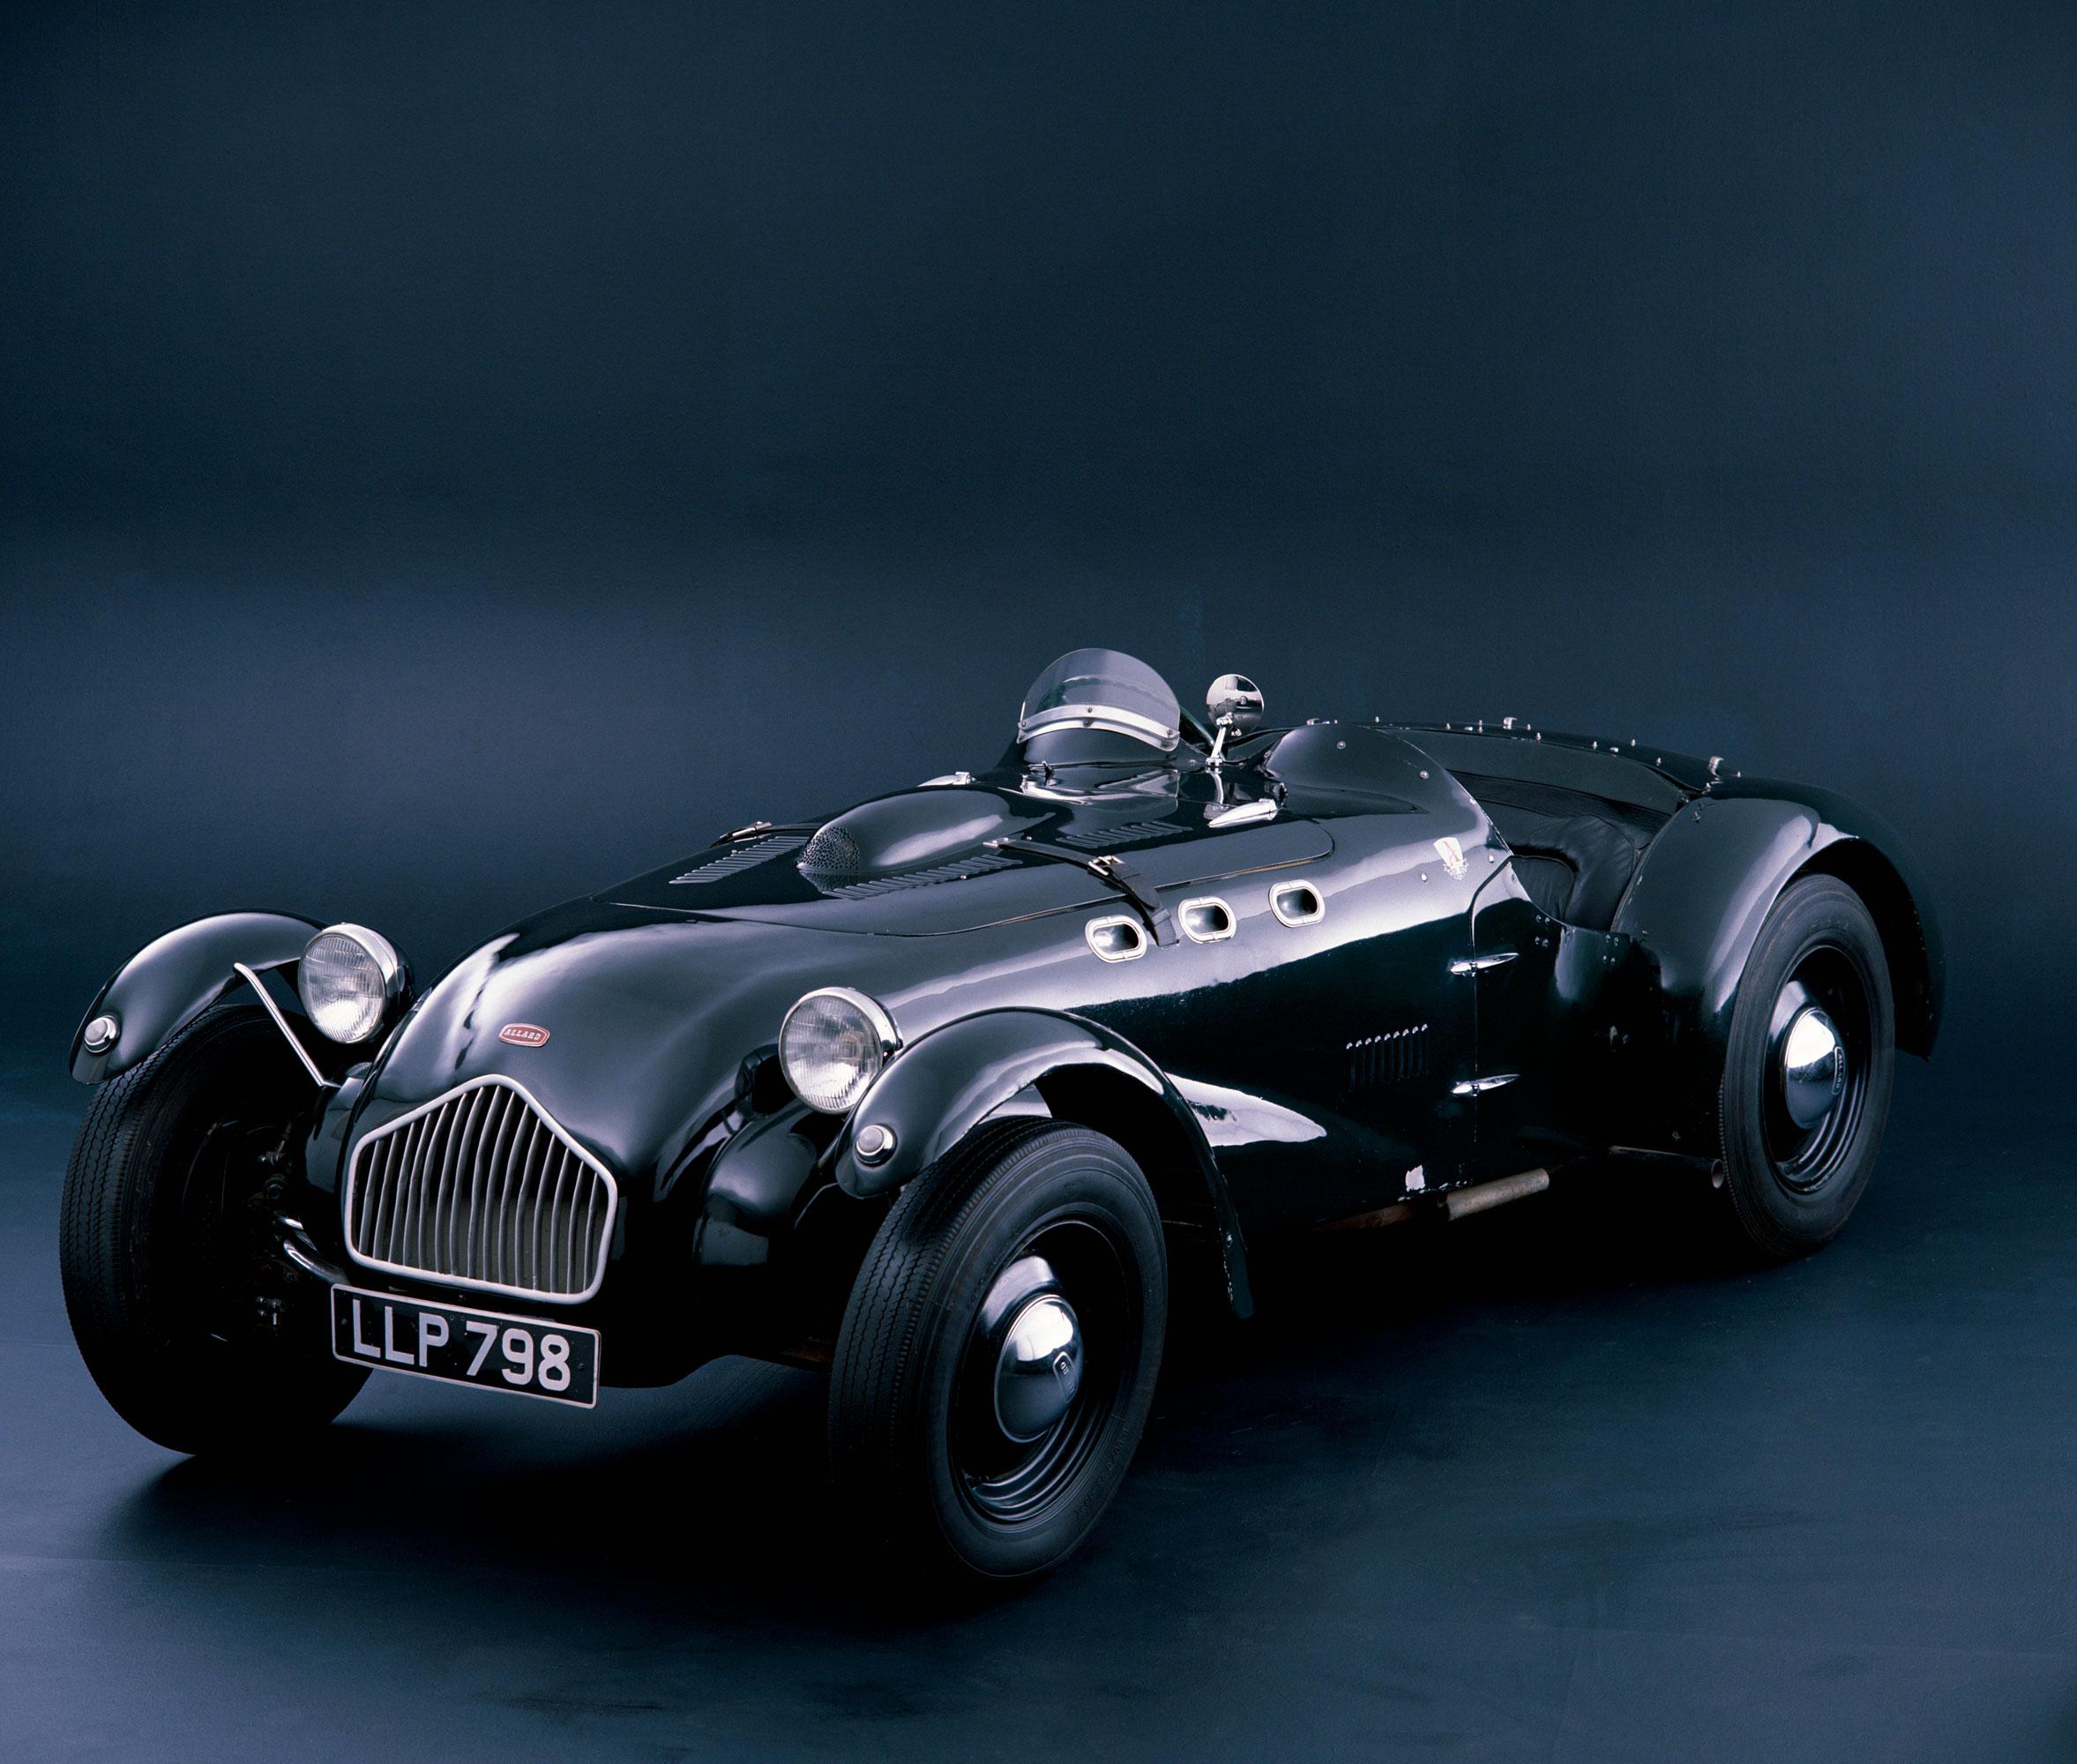 A 1950 Allard J2 racing car